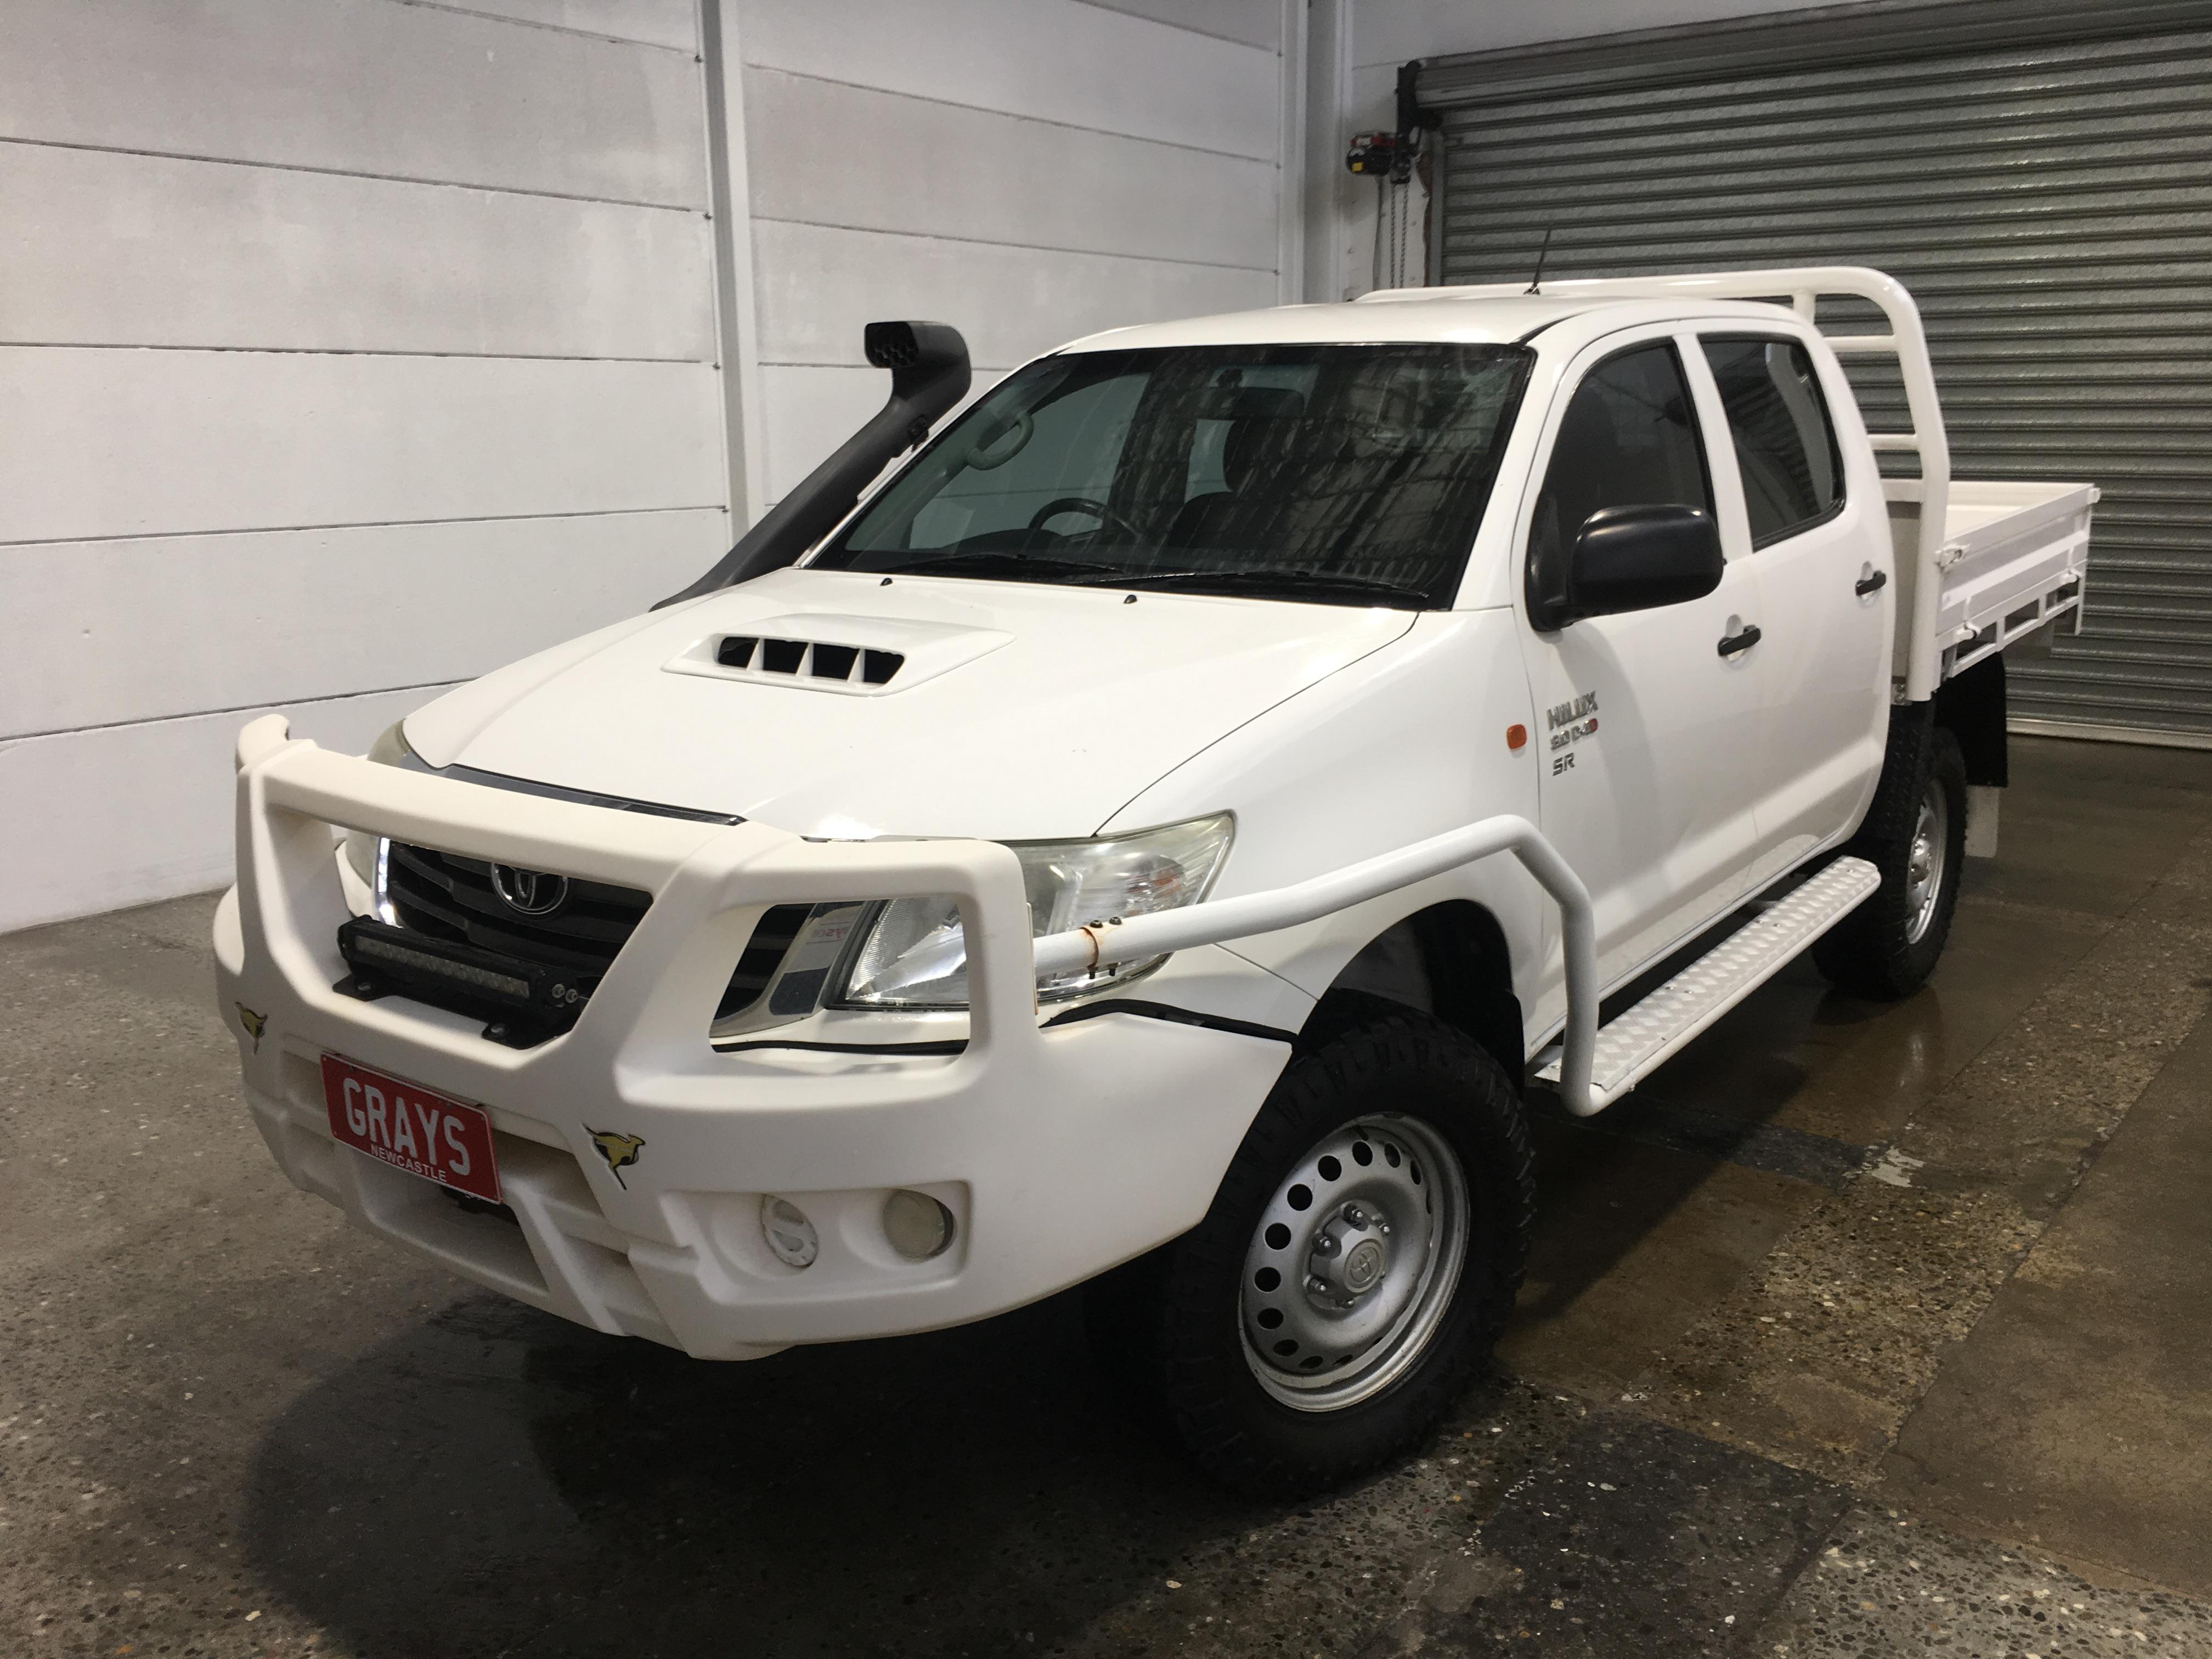 2013 Toyota Hilux SR (4x4) KUN26R Turbo Diesel Manual Crew Cab Chassis